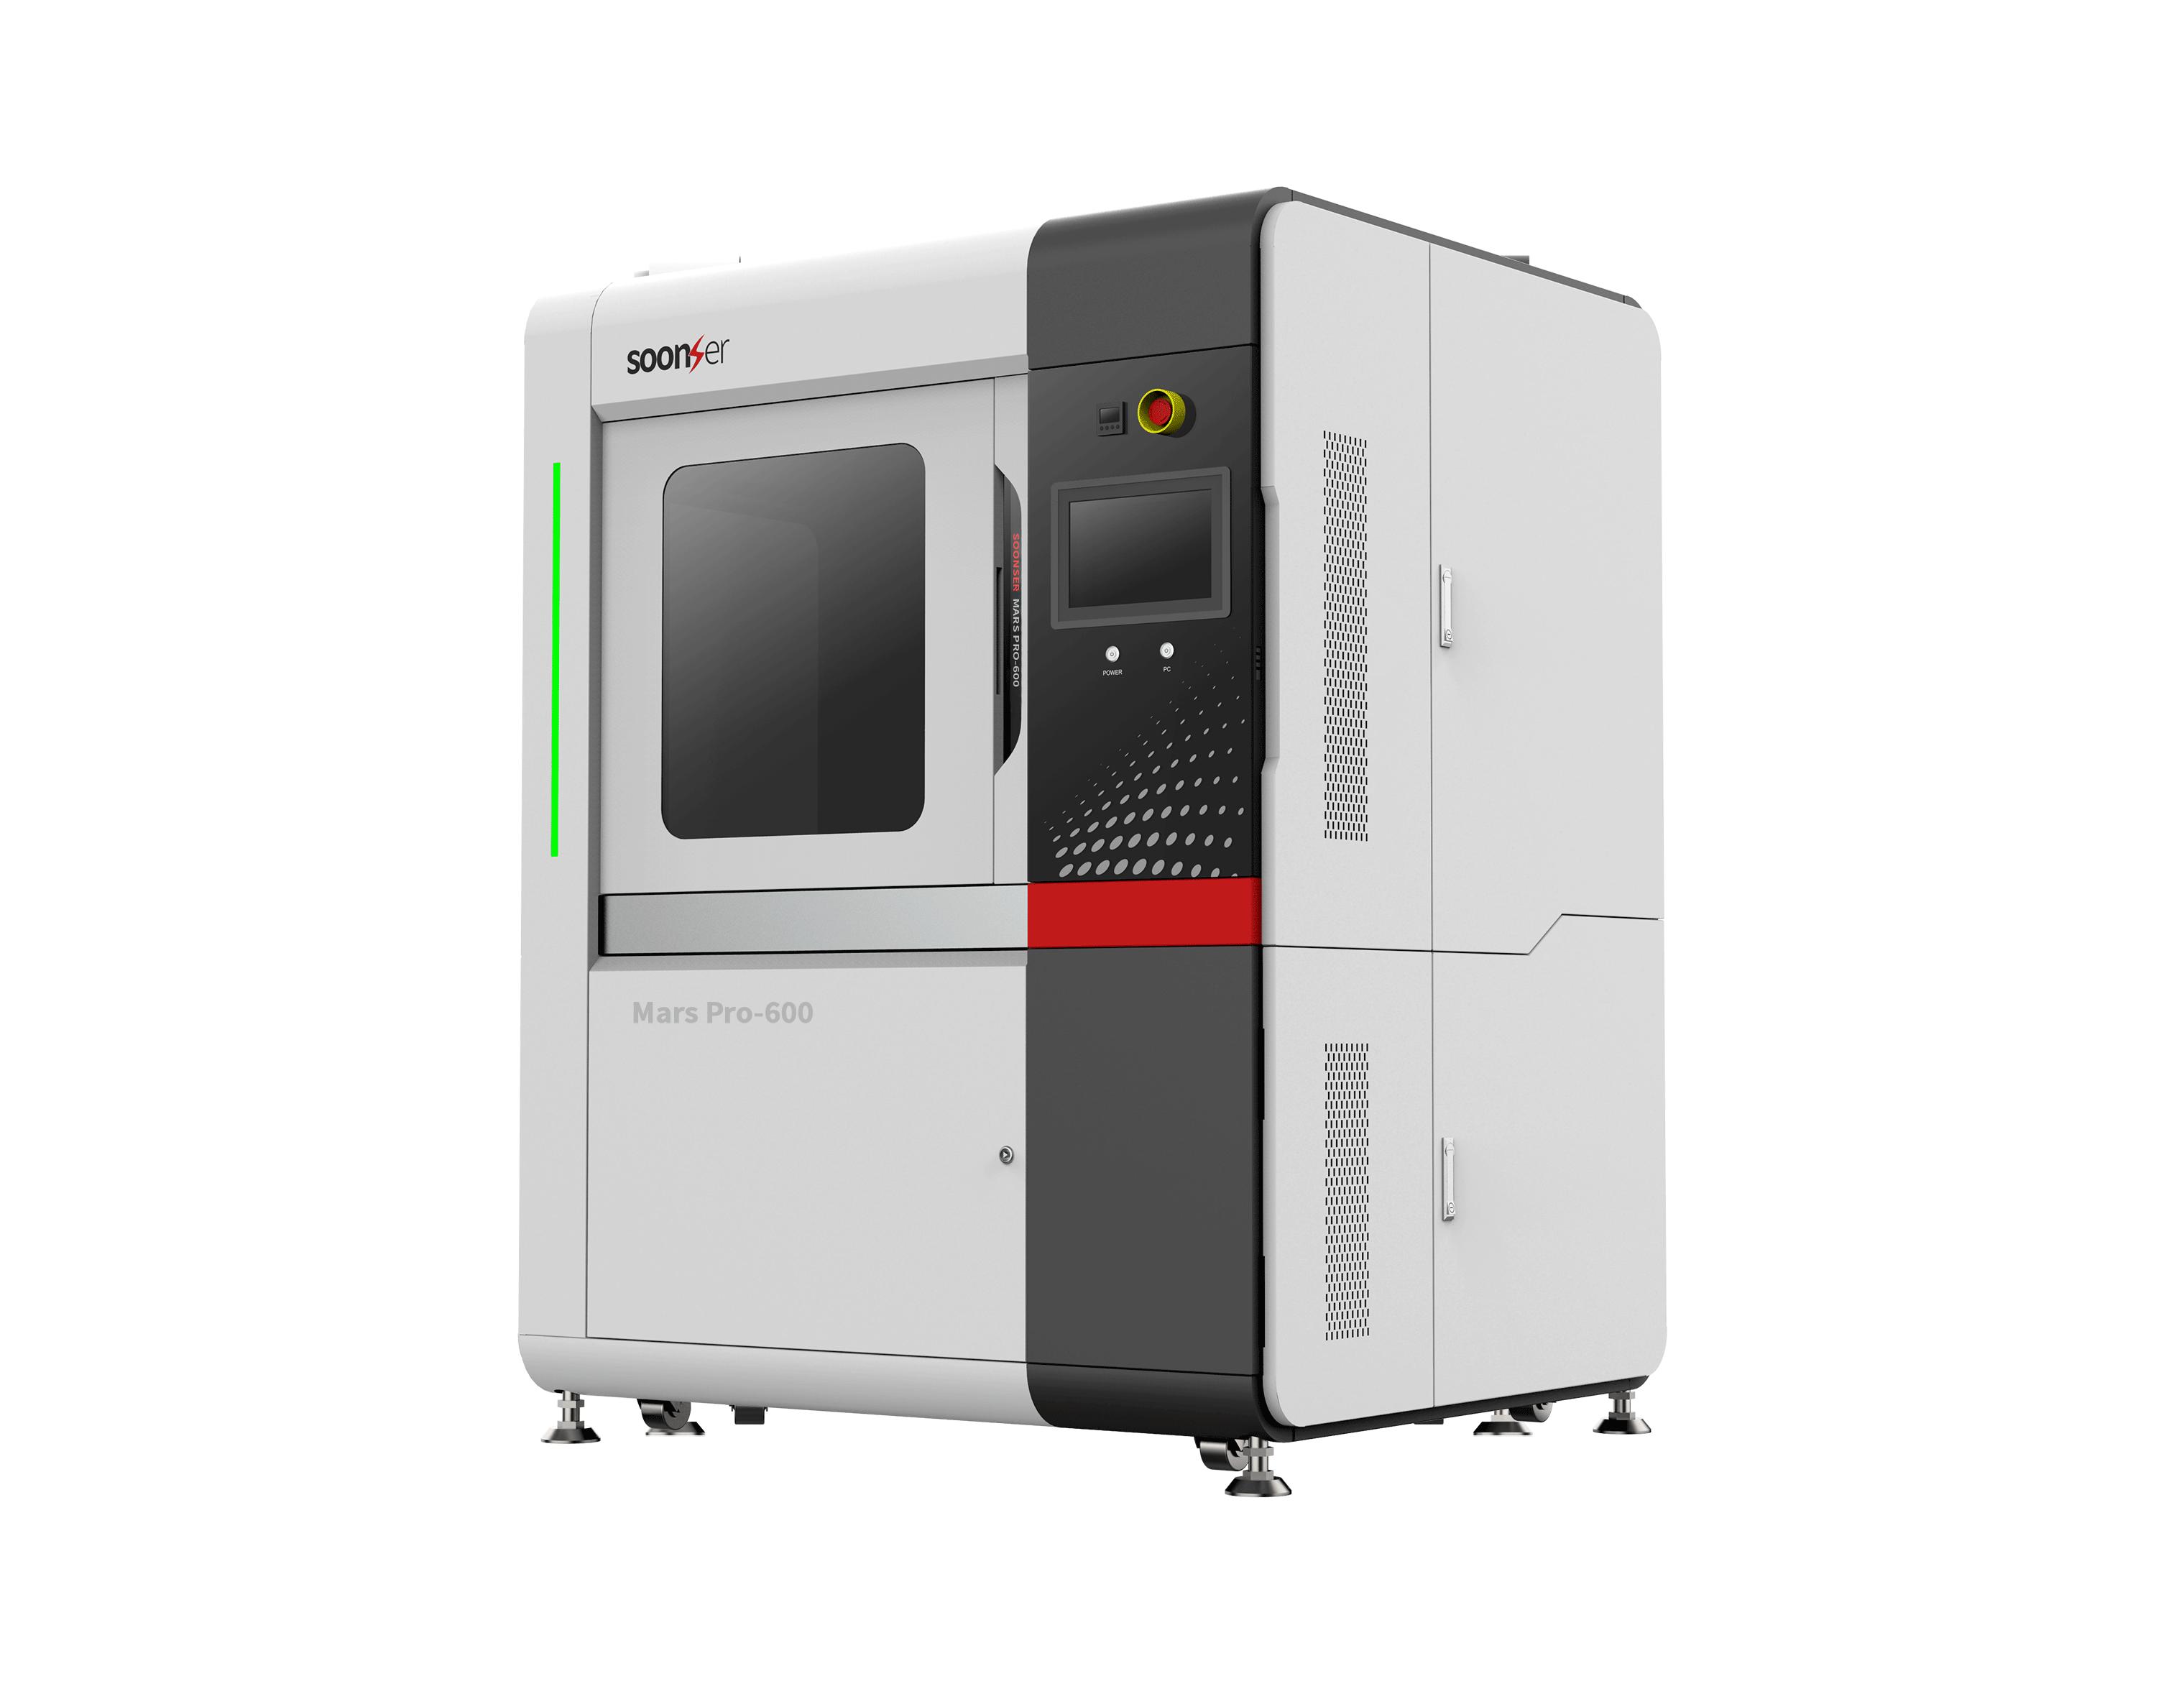 The Mars Pro 600 3D printer. Photo via SoonSolid.